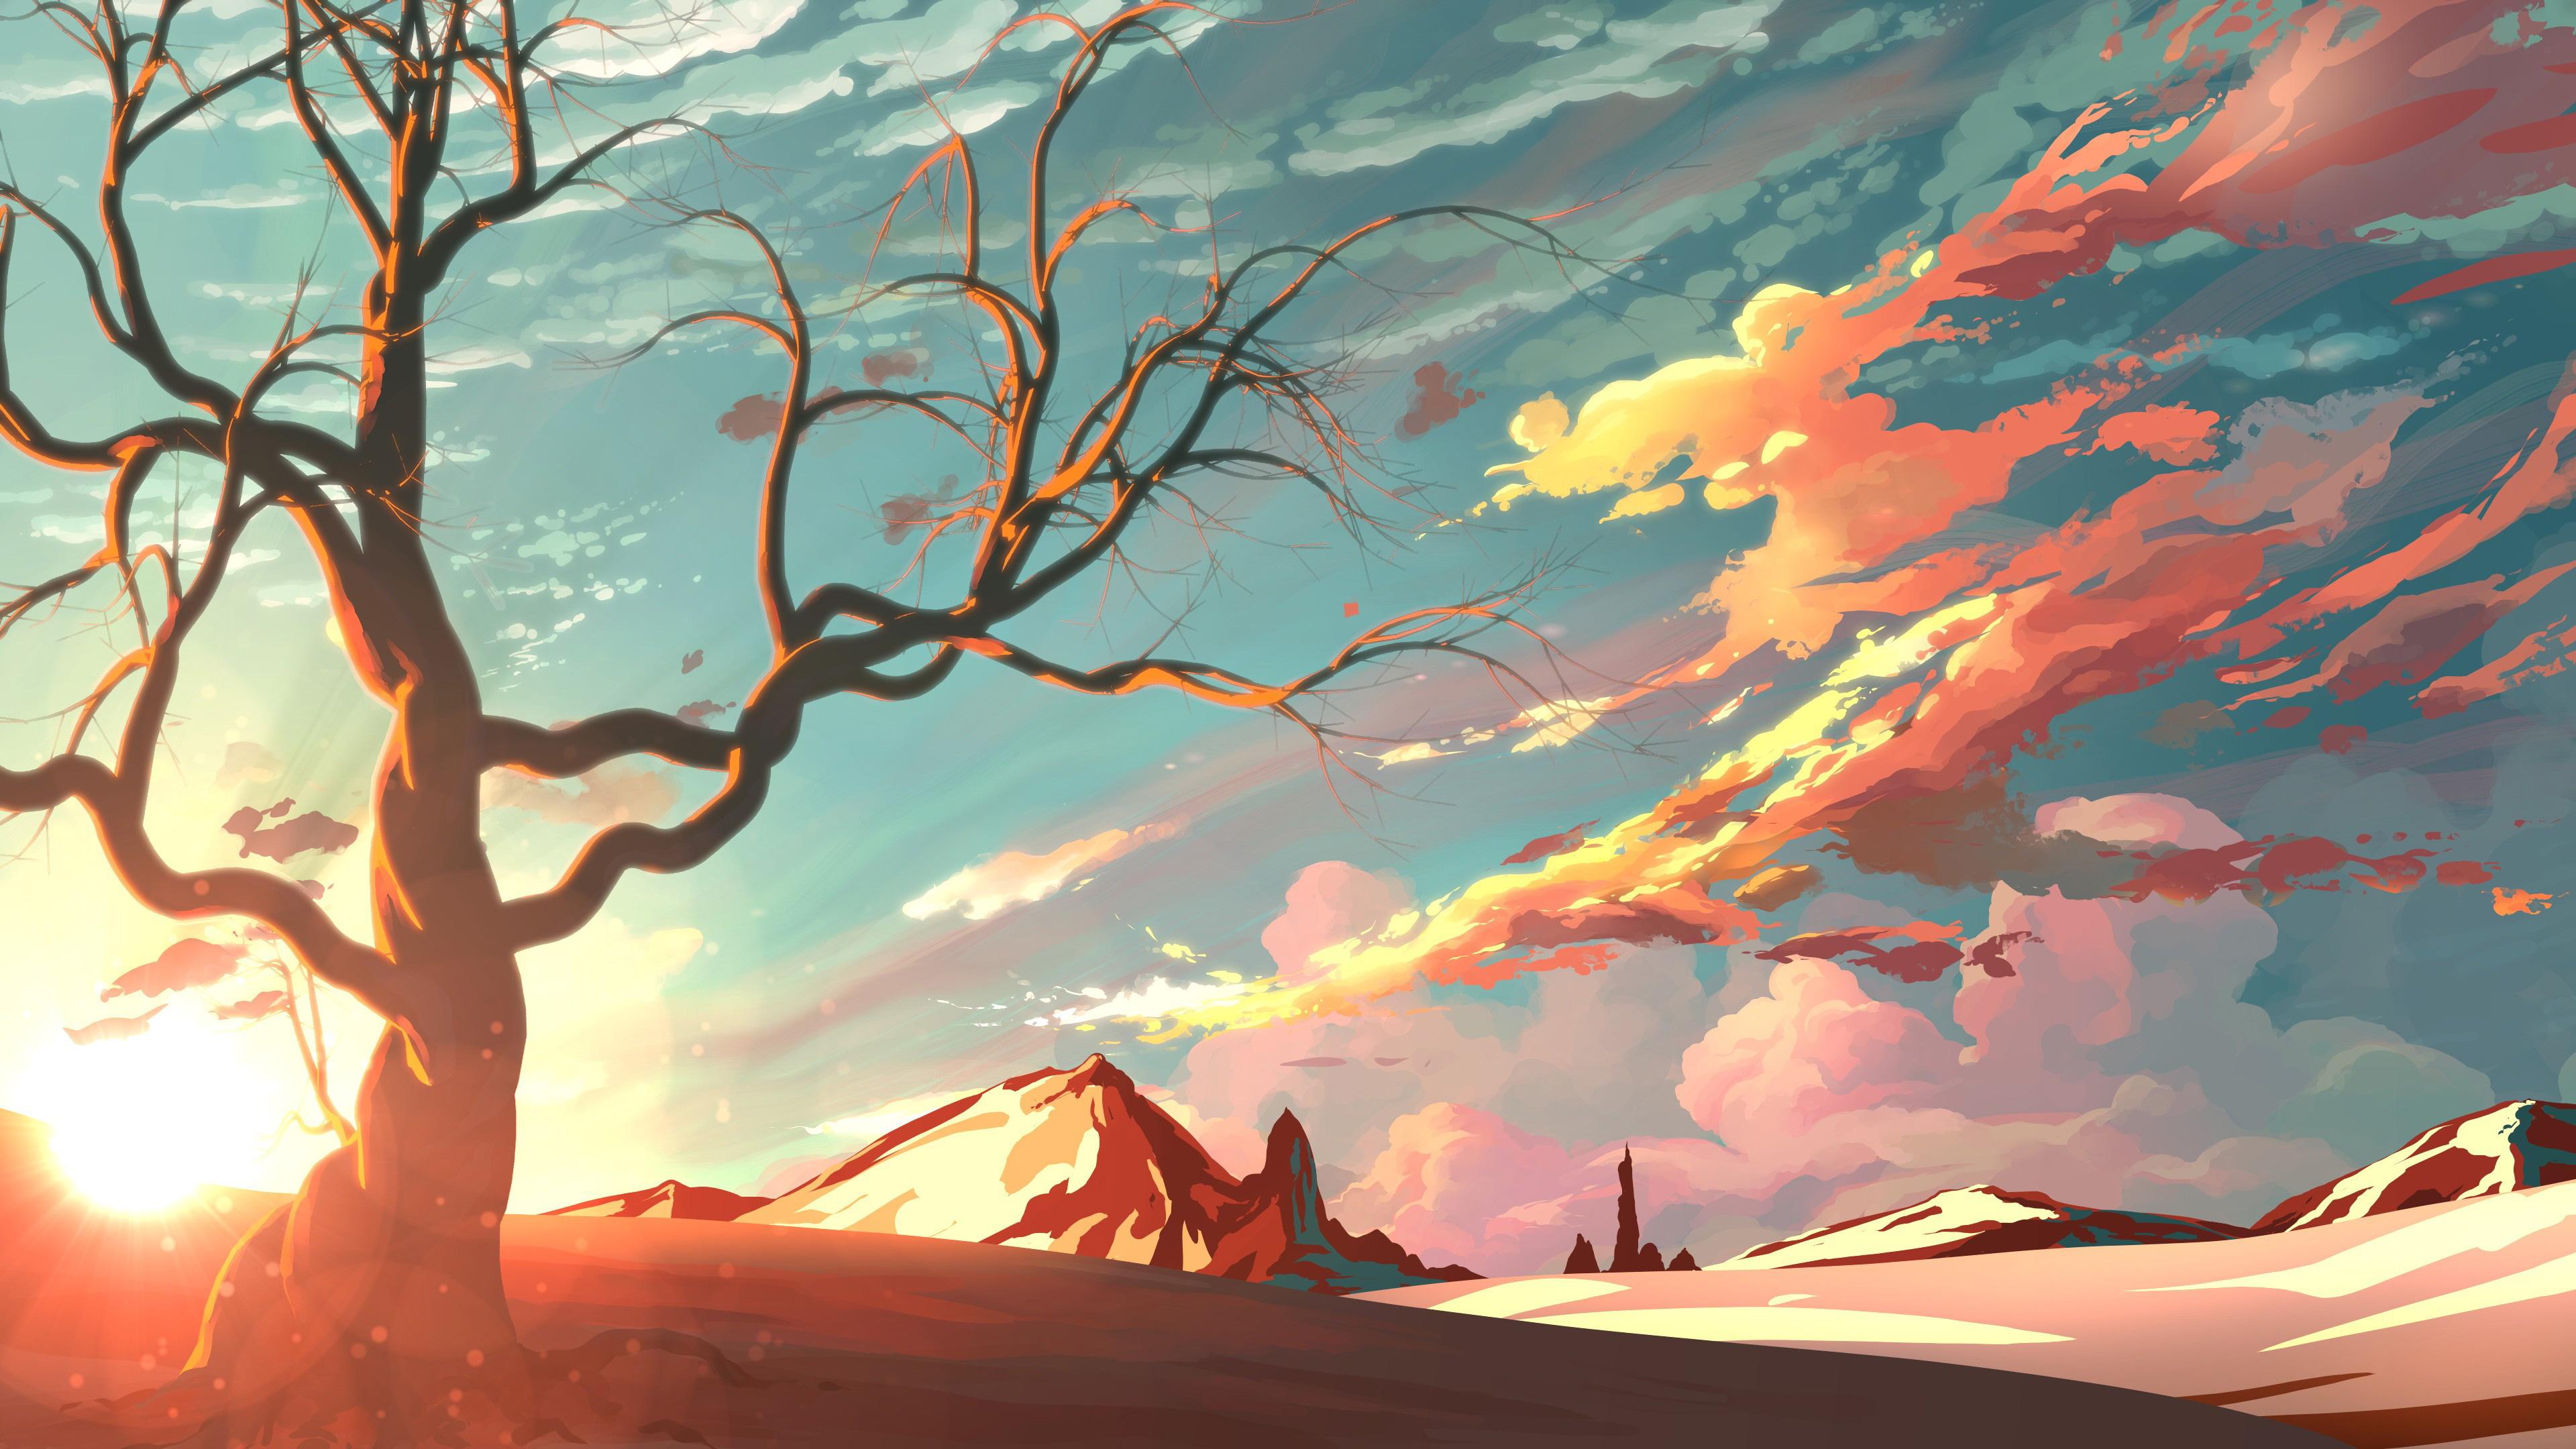 Digital Art Tree Sky Mountains Hd Artist 4k Wallpapers